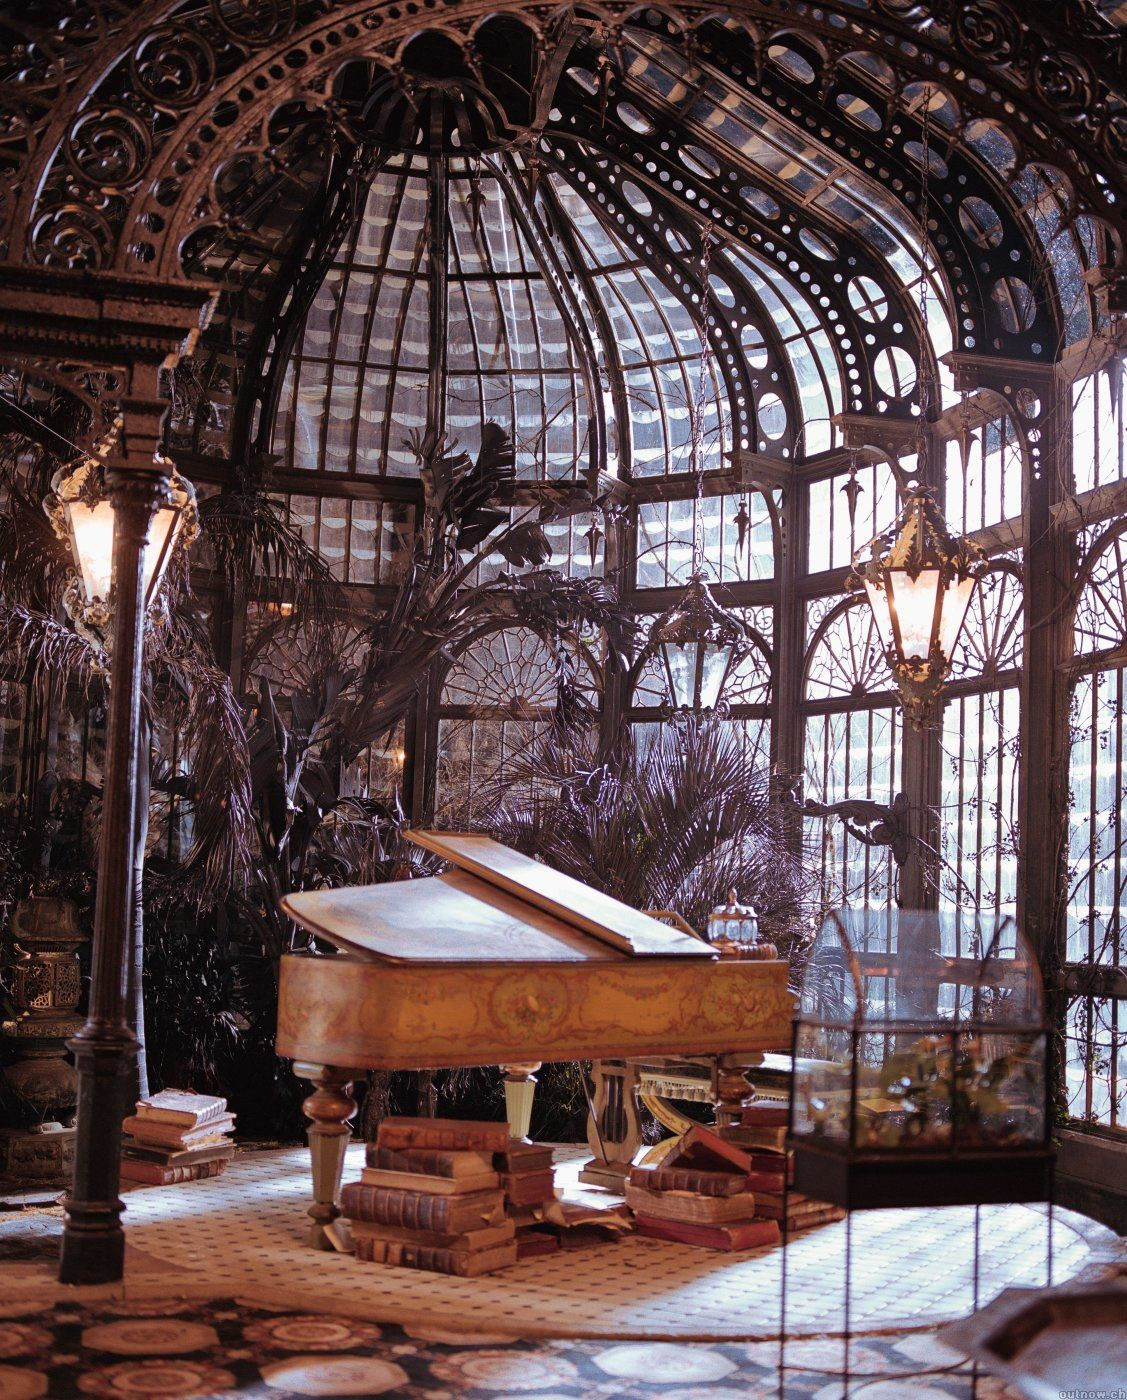 Cool Steampunk Bedroom Interior Decorating Design Ideas Mansion - Cool rooms and interior design ideas